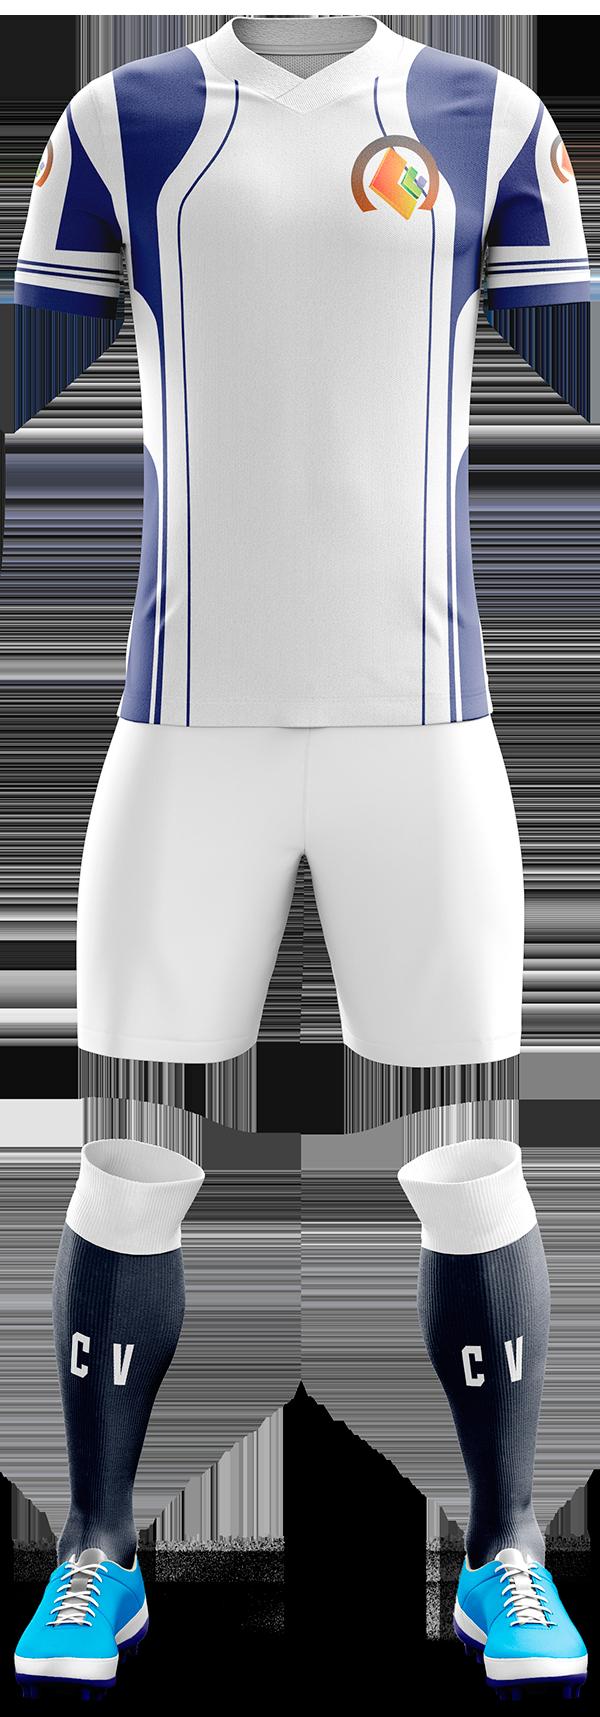 camisa-esportiva-n-27.png